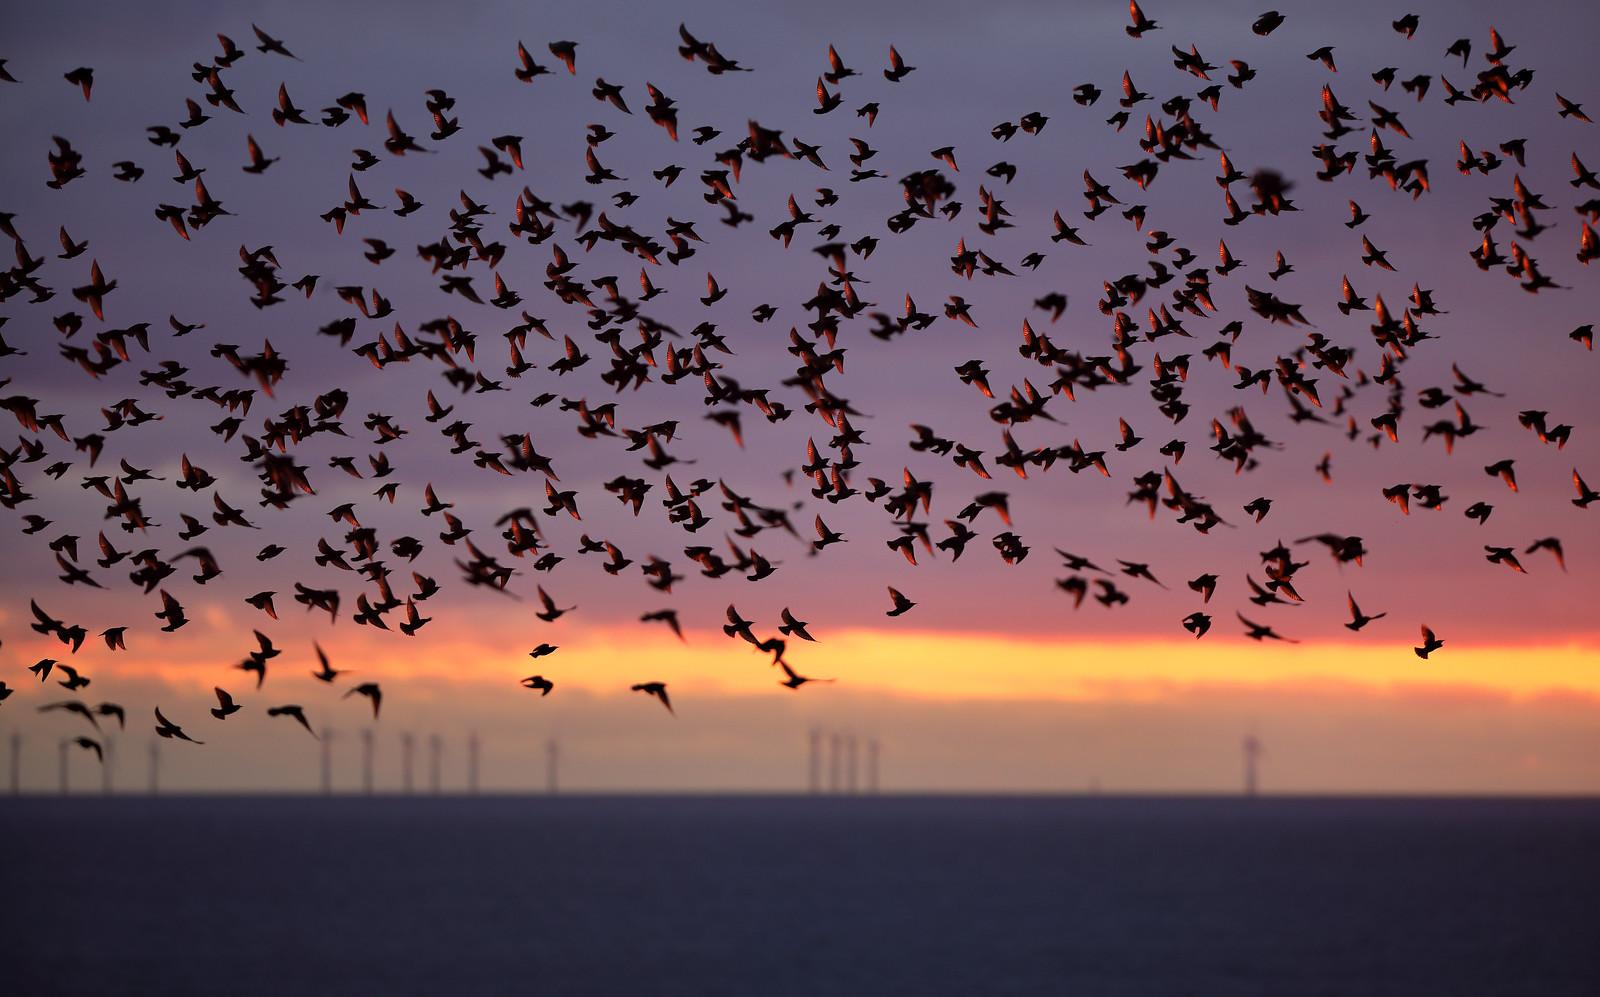 Iridescent Starling Murmuration and Rampion Wind Farm